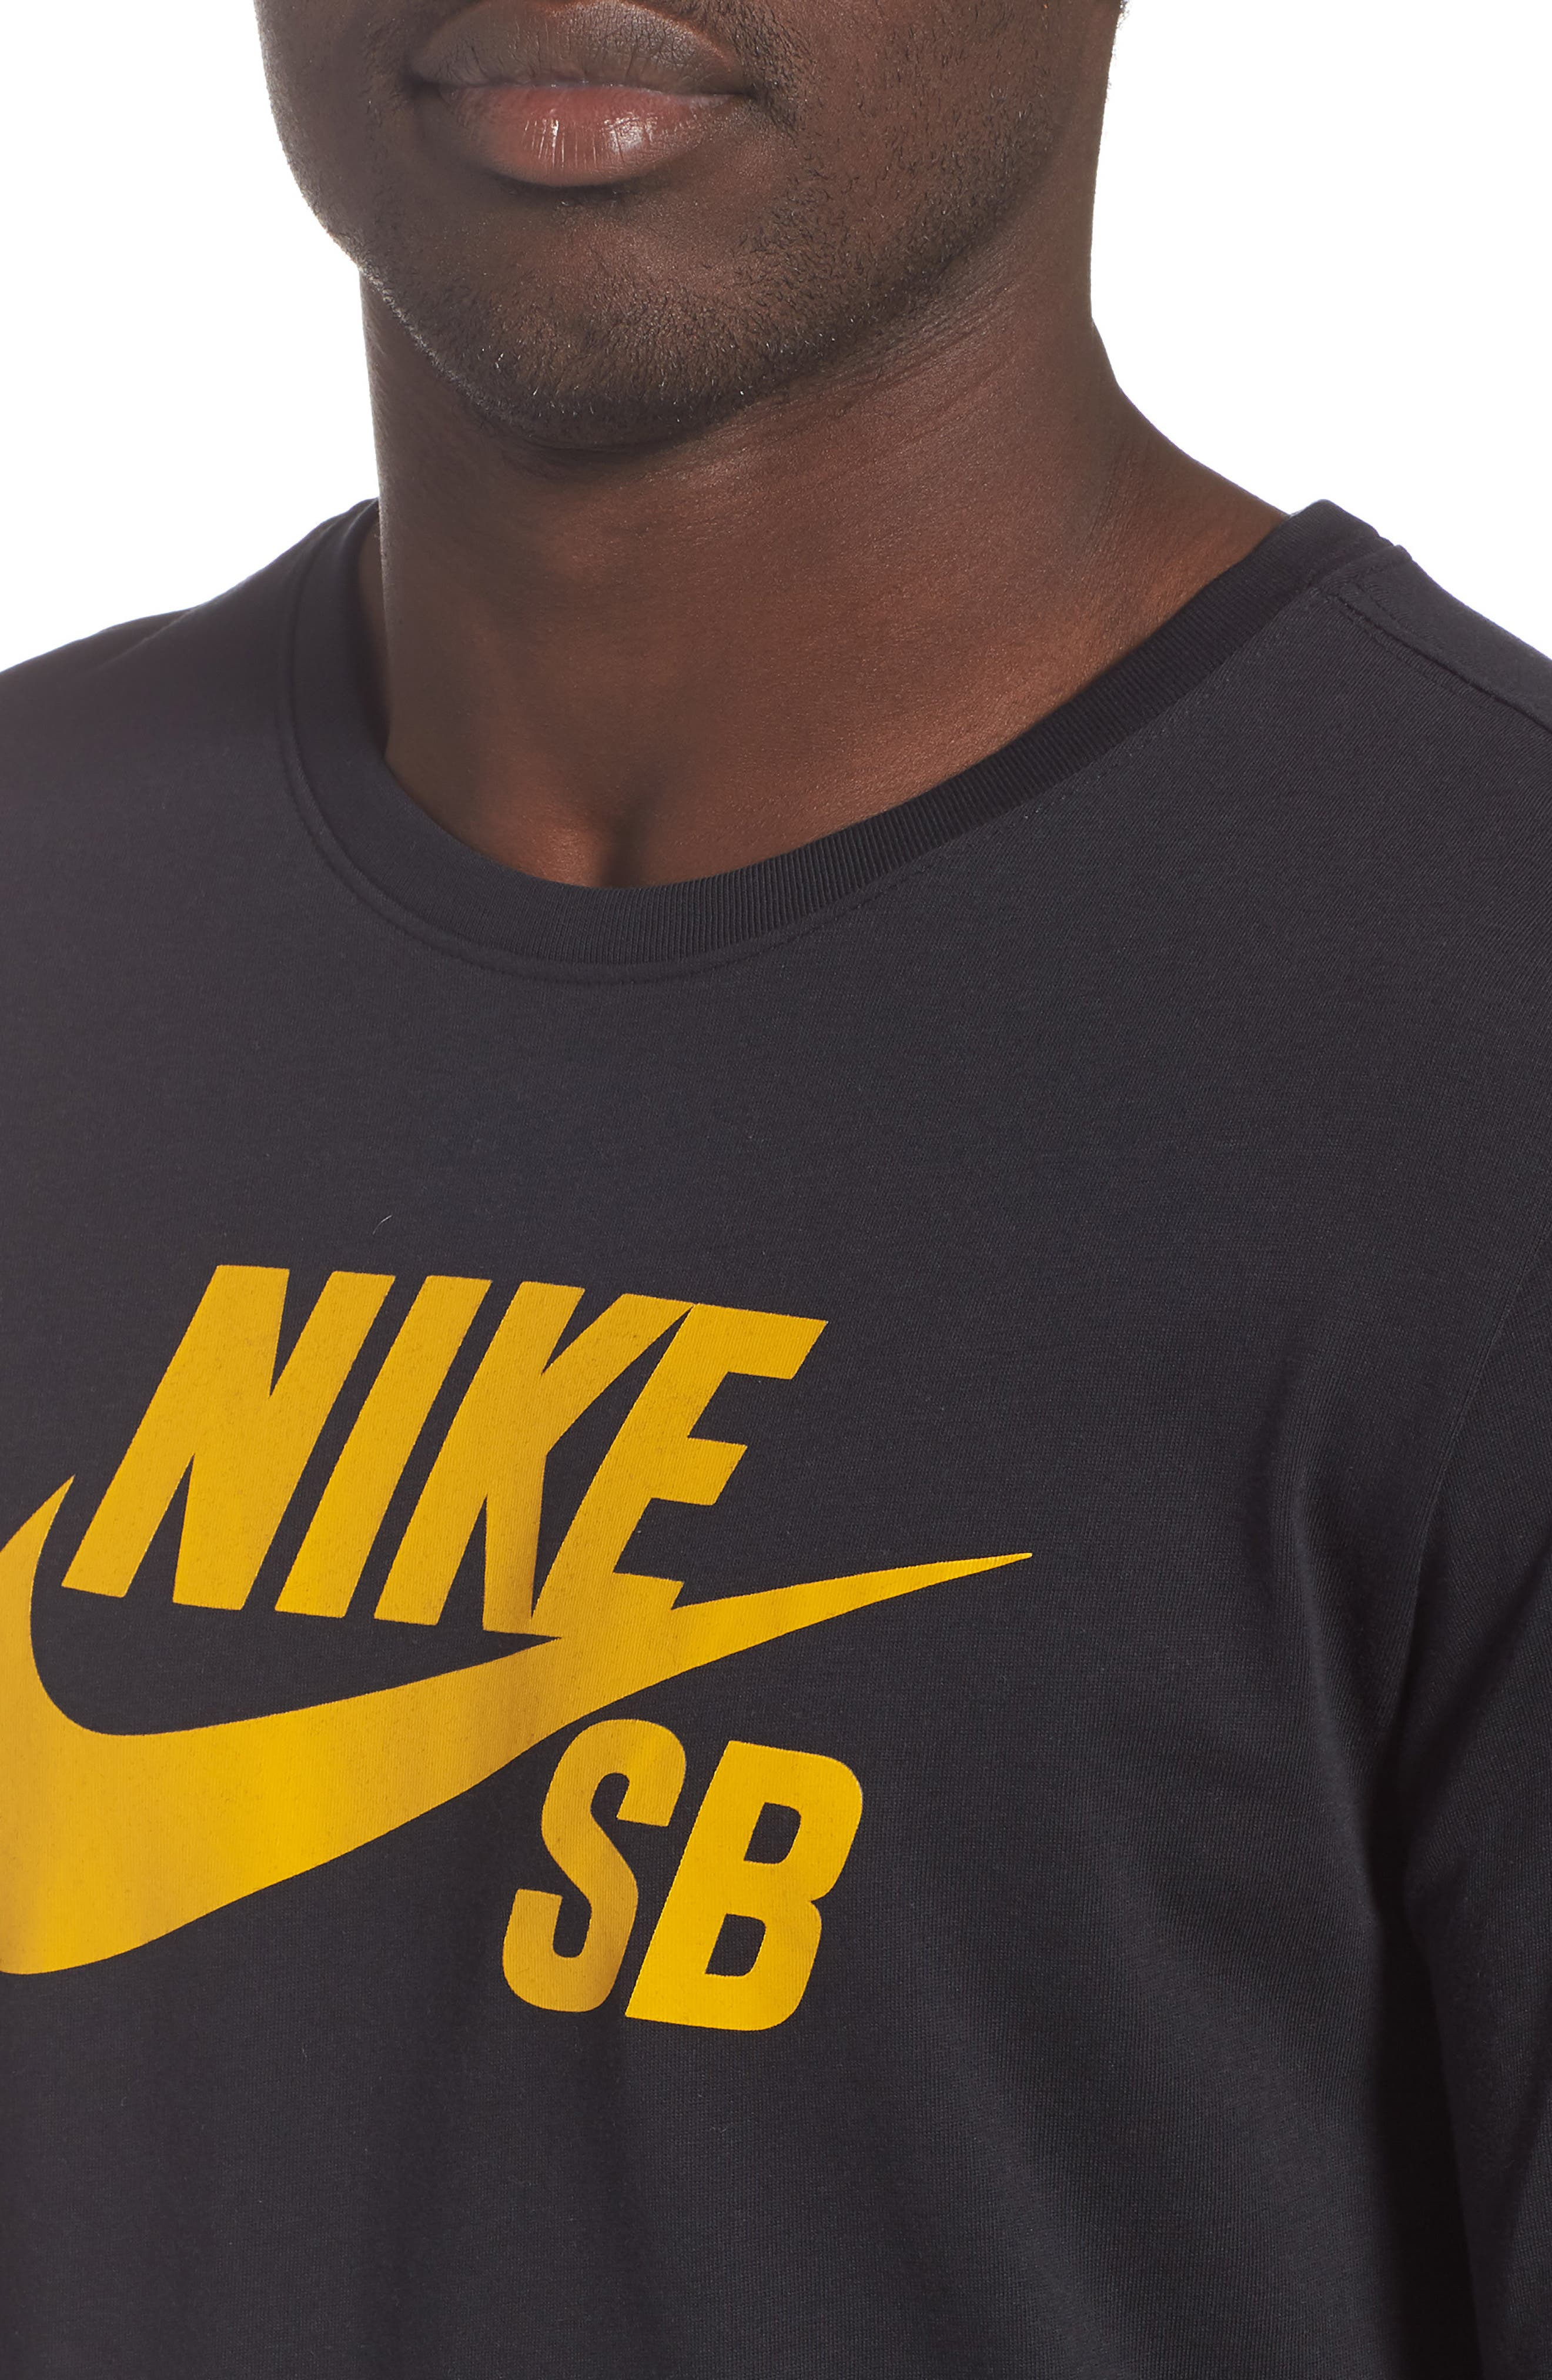 Nike 'SB Logo' T-Shirt,                             Alternate thumbnail 4, color,                             BLACK/ YELLOW/ OCHRE